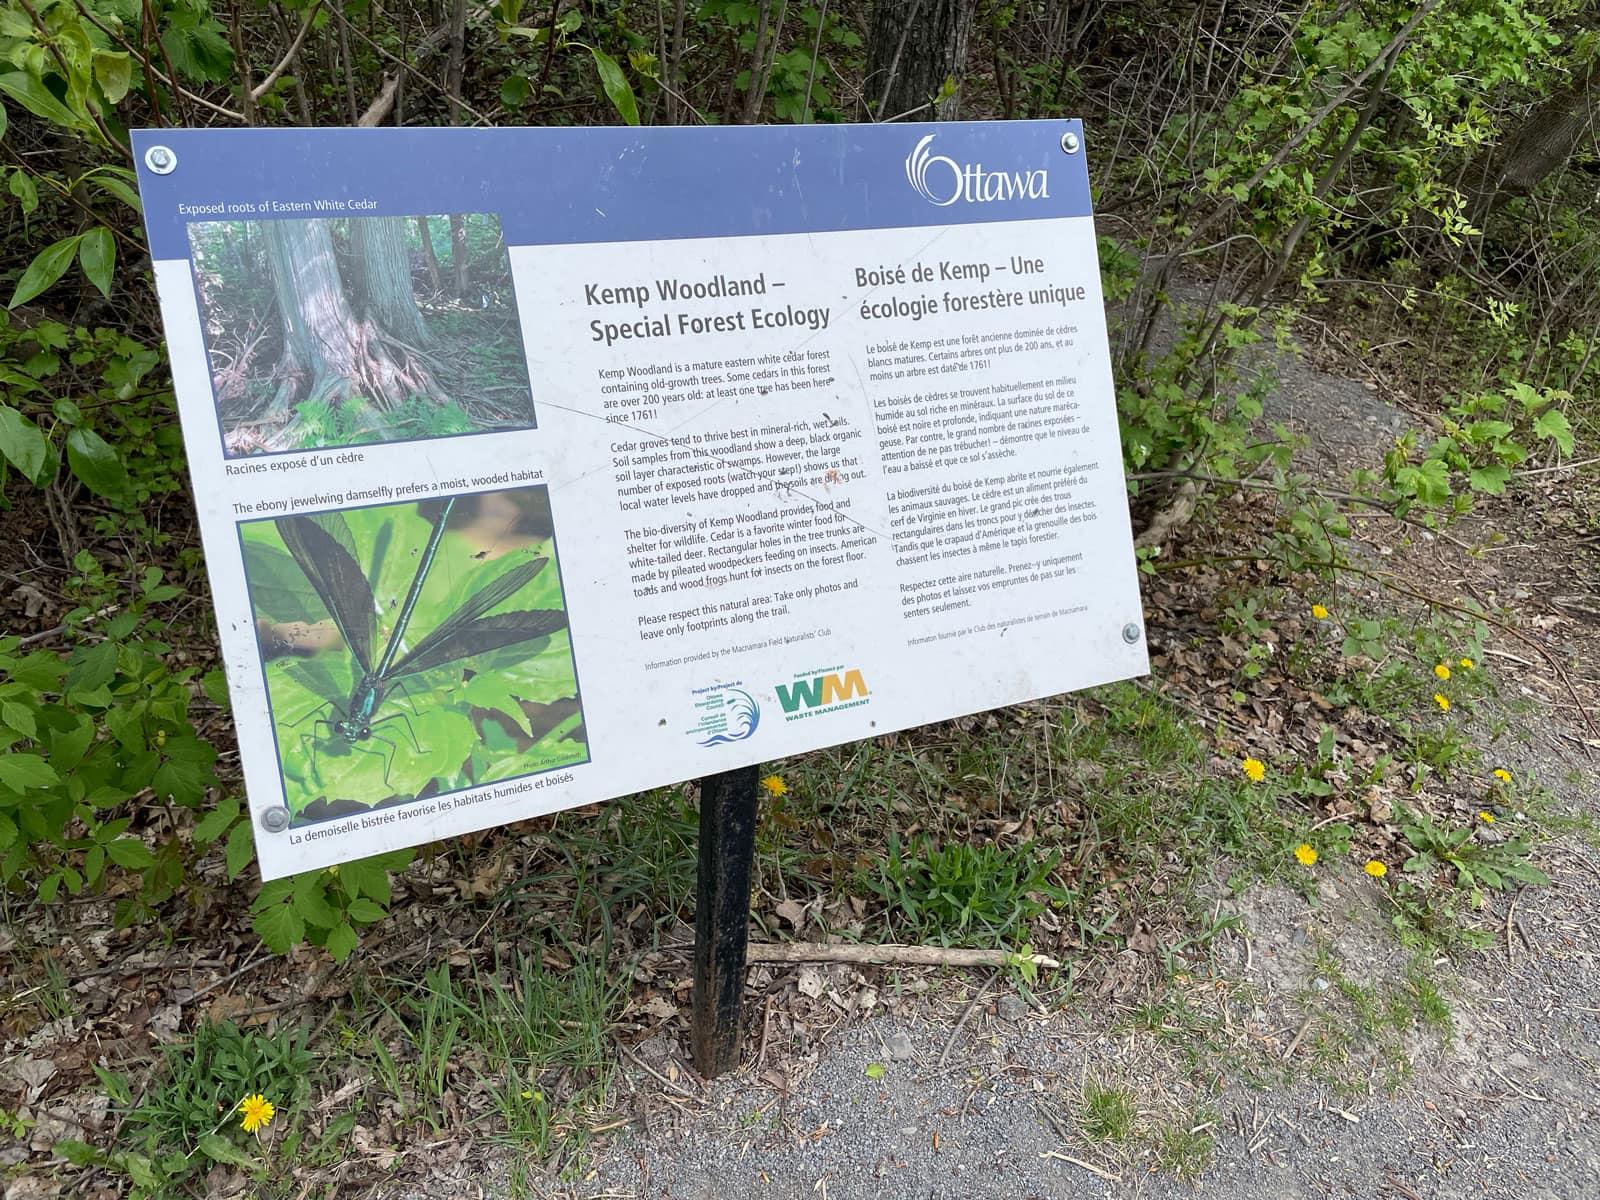 Signage at Kemp Woodland